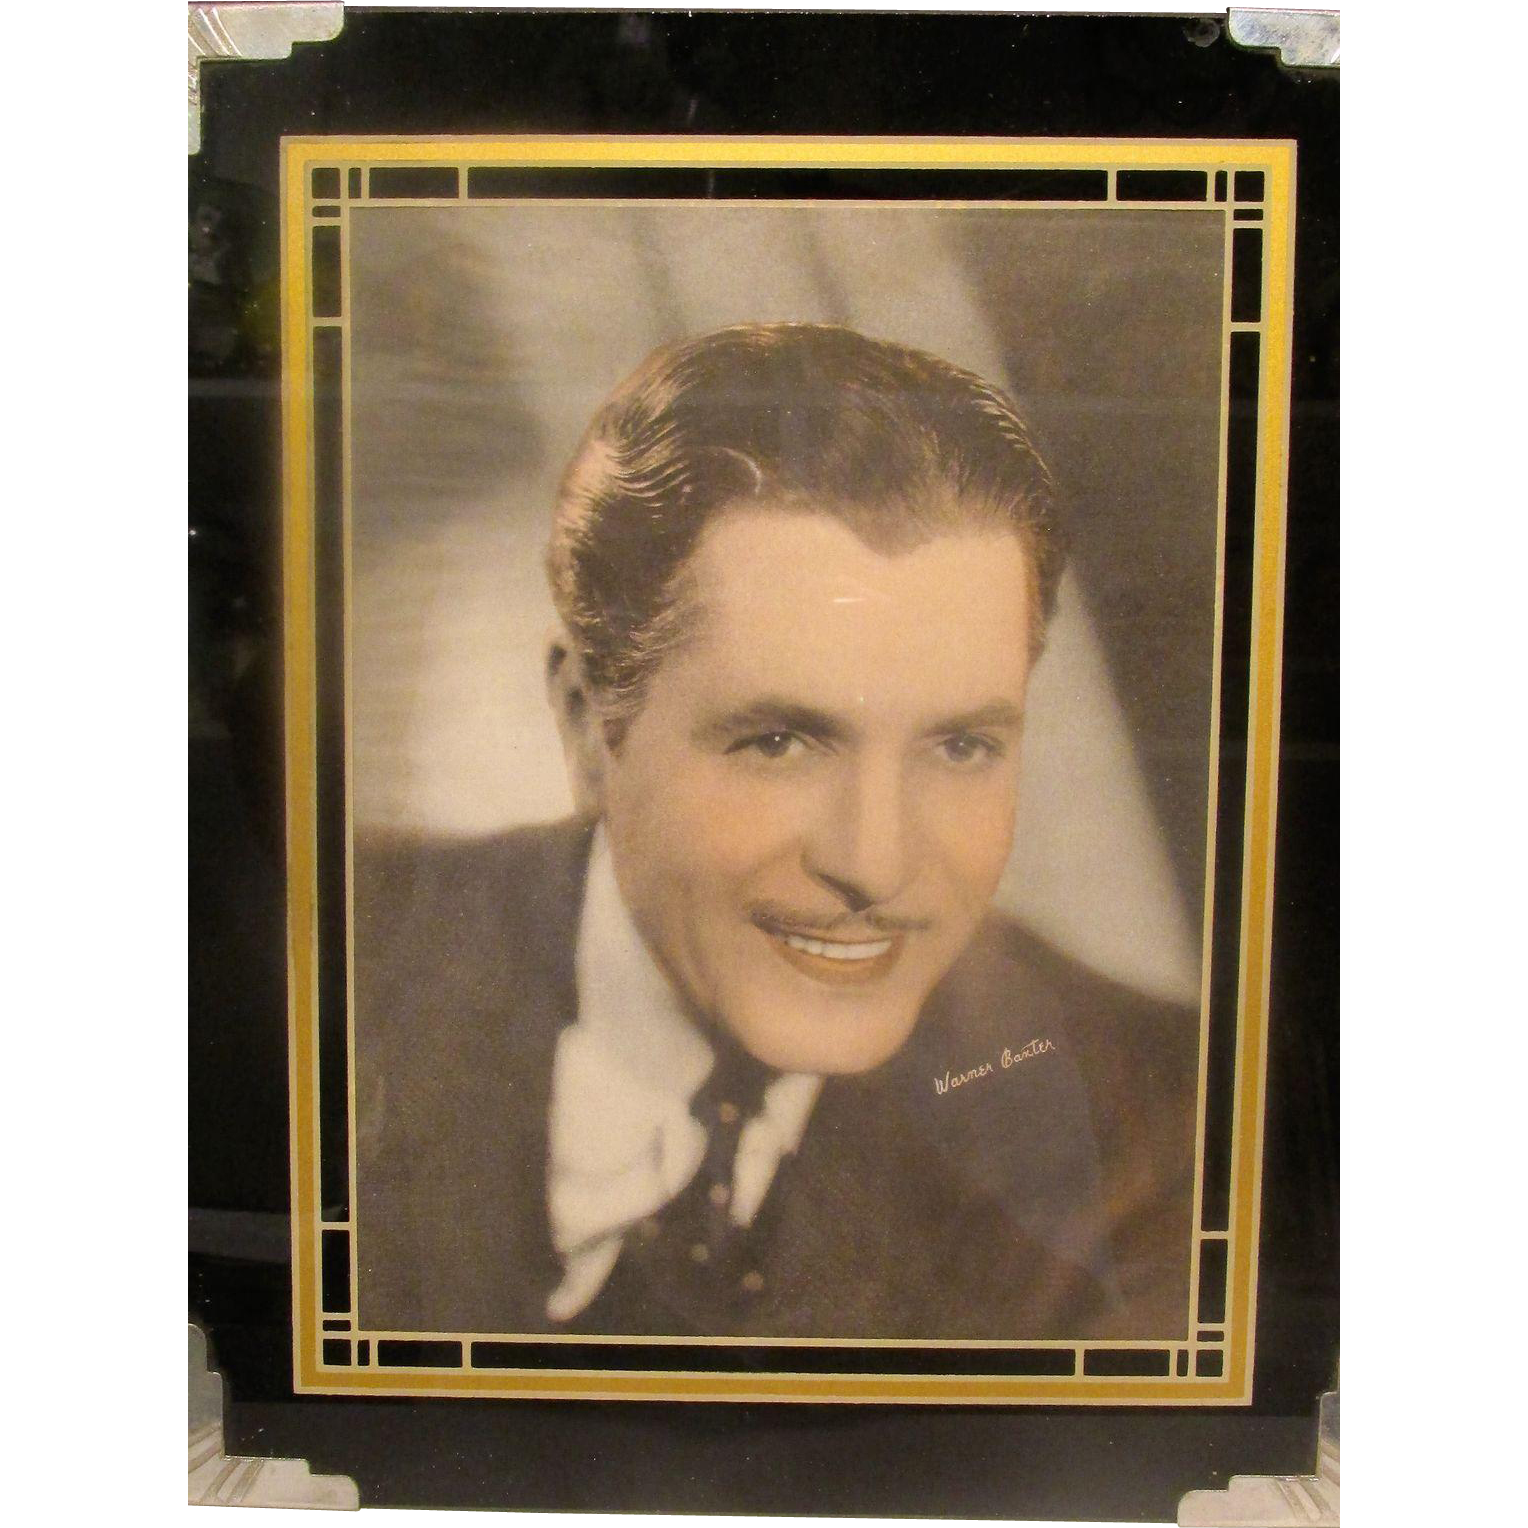 Reverse Painted Frame w/ Warner Baxter